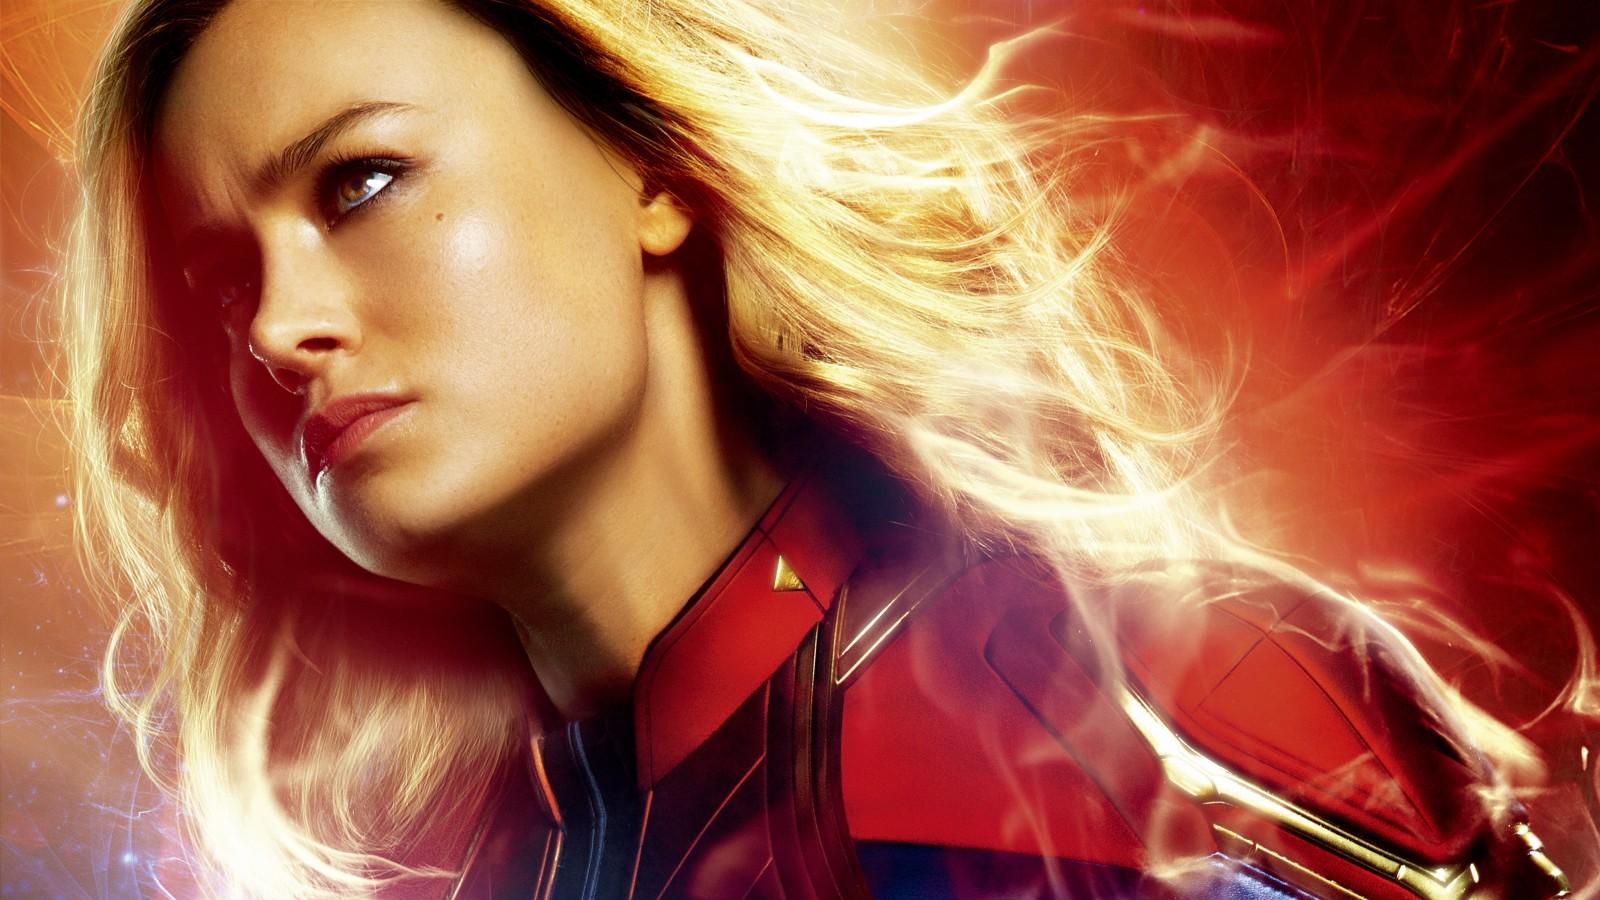 3d Apple Wallpaper Hd 1080p Download Brie Larson As Captain Marvel 4k 8k Wallpapers Hd